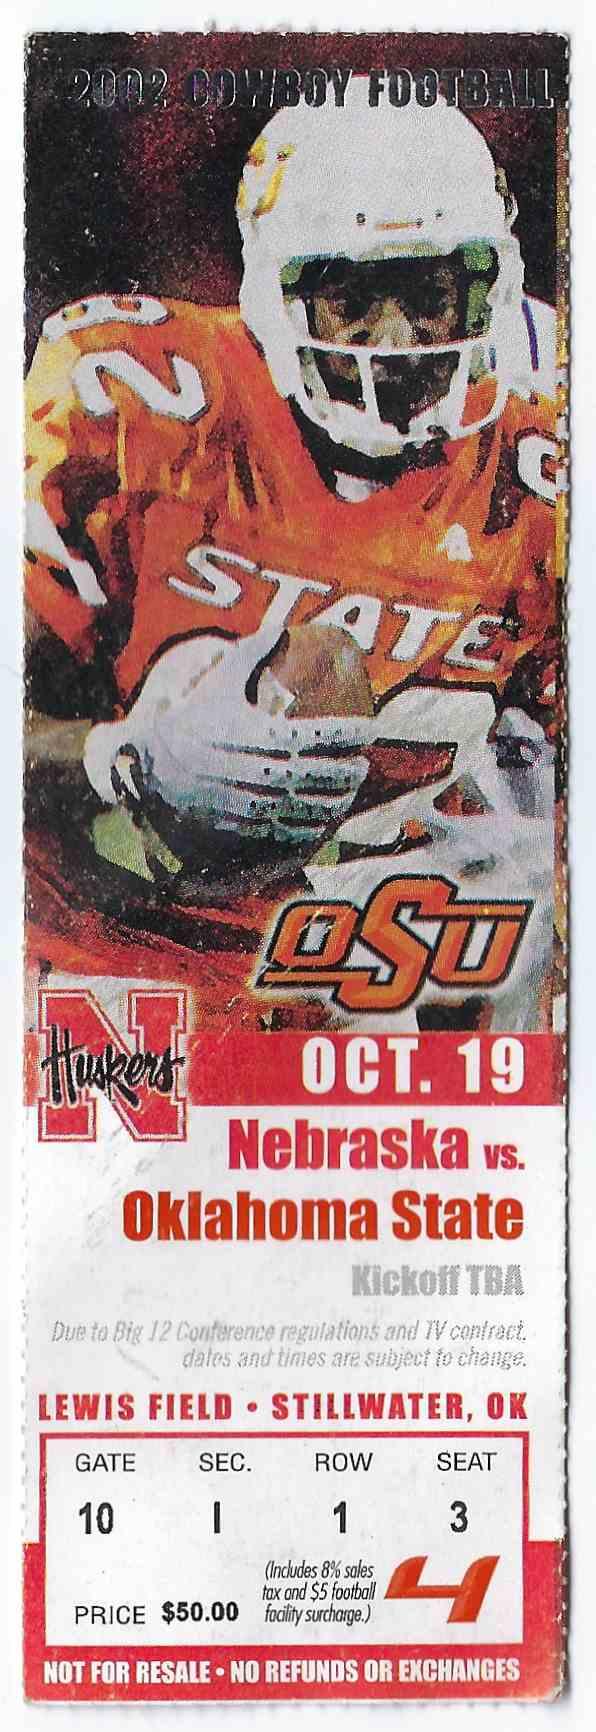 2002 College Football Ticket Stub Nebraska Vs Oklahoma State card front image